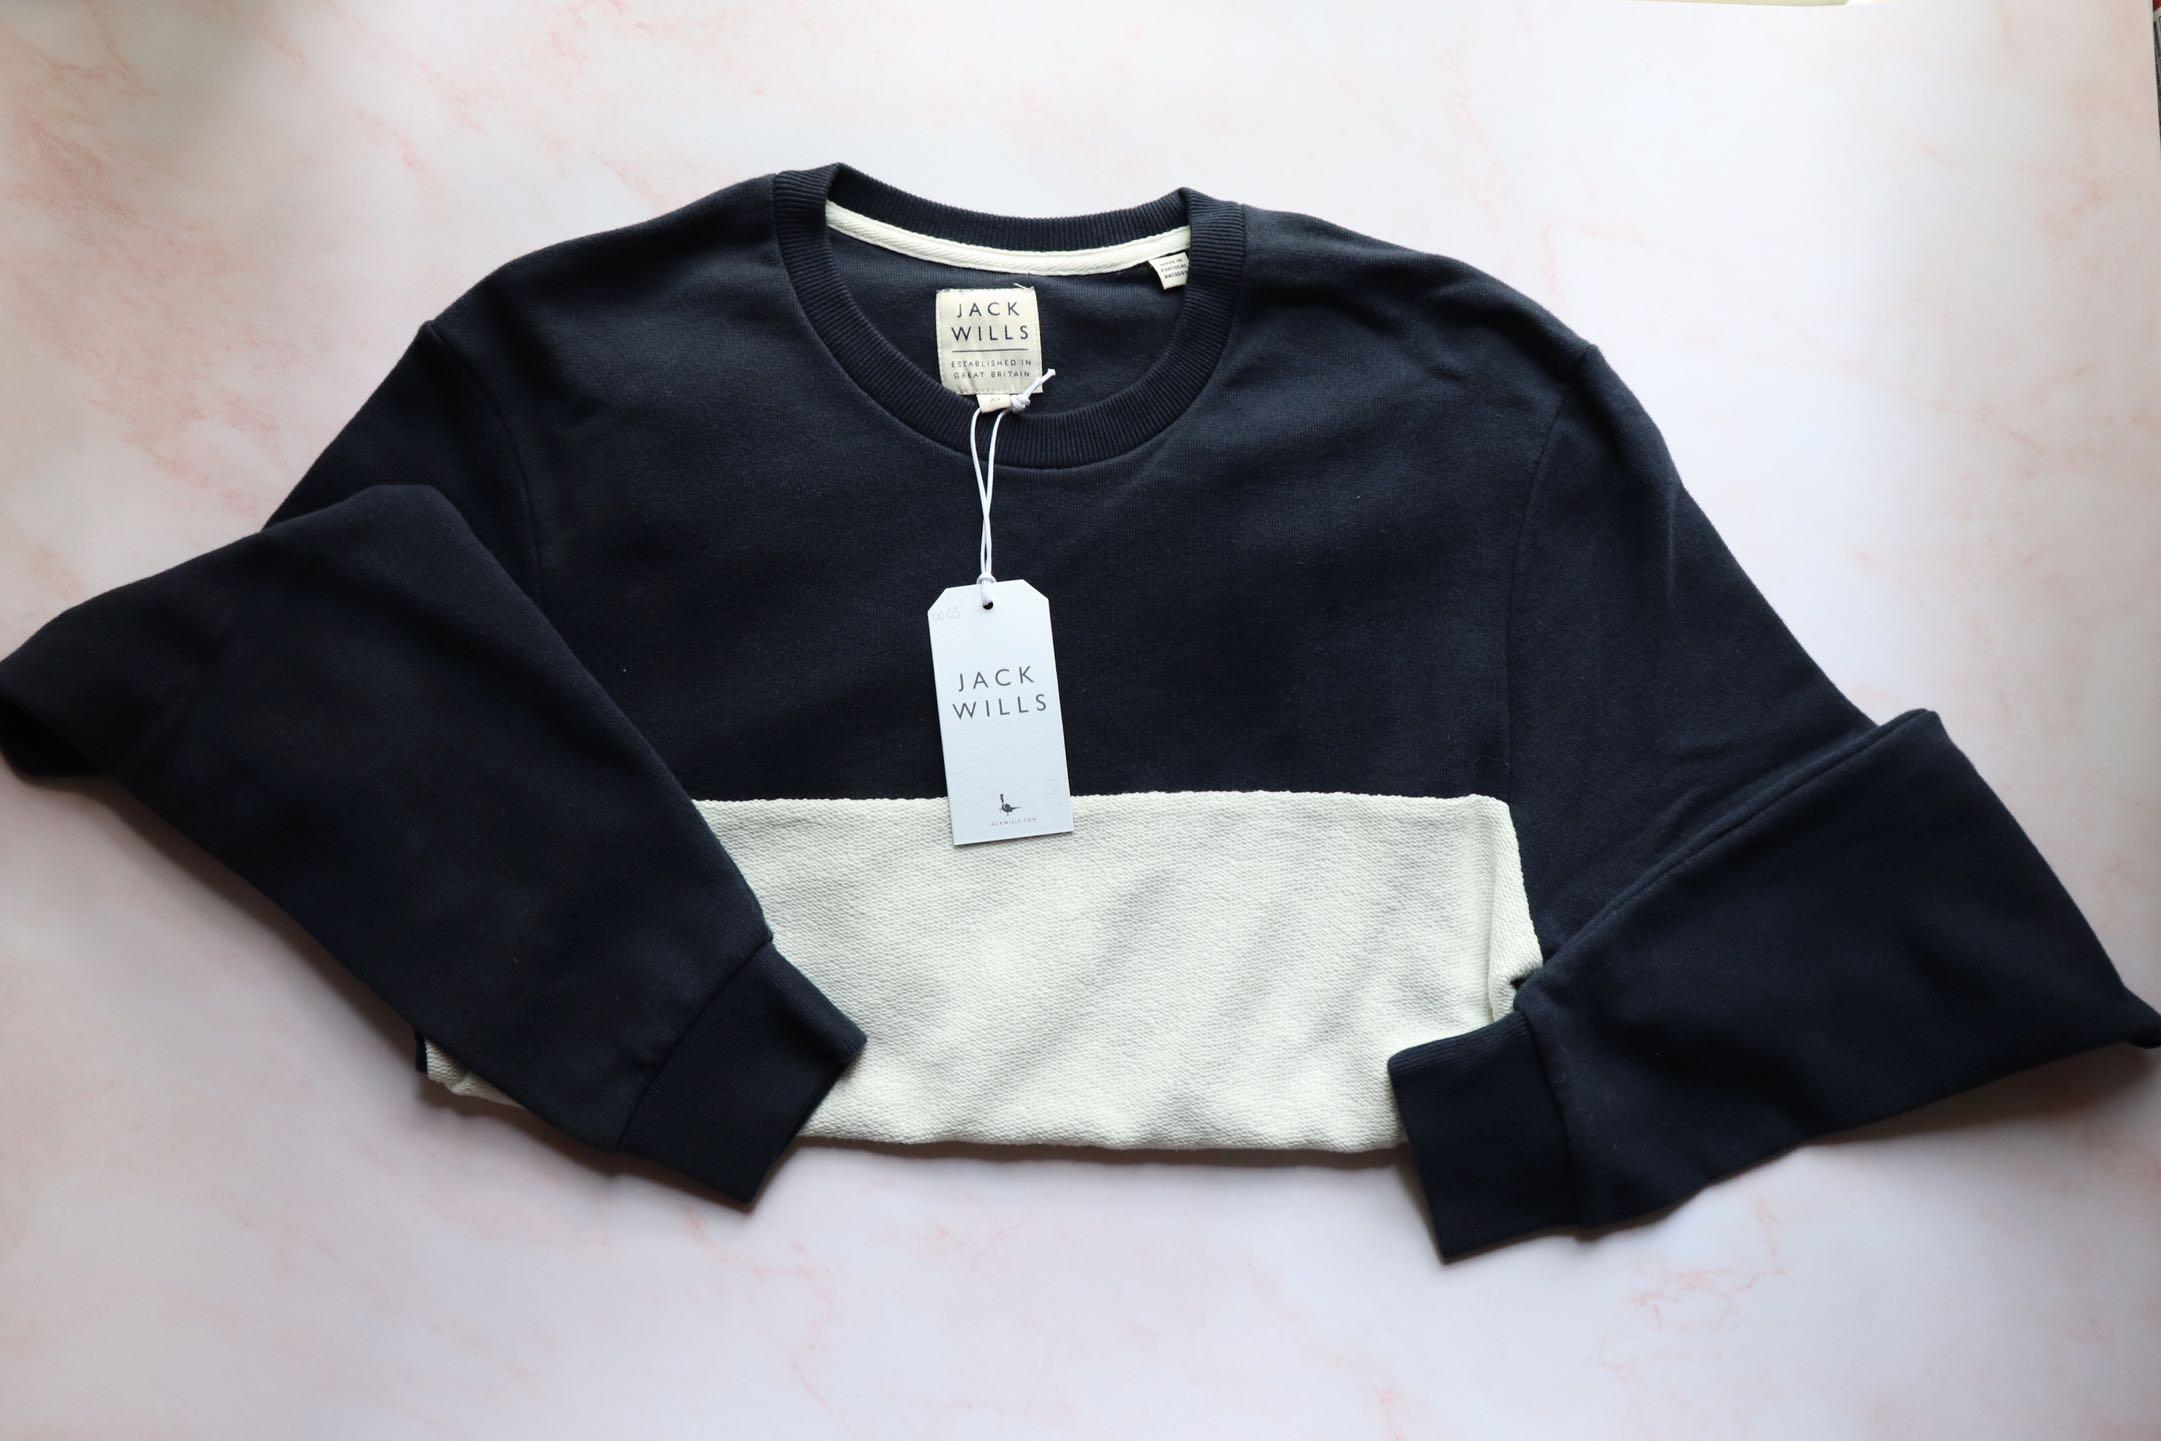 🇬🇧[全新]Jack Wills - Sweatshirt 男裝長袖